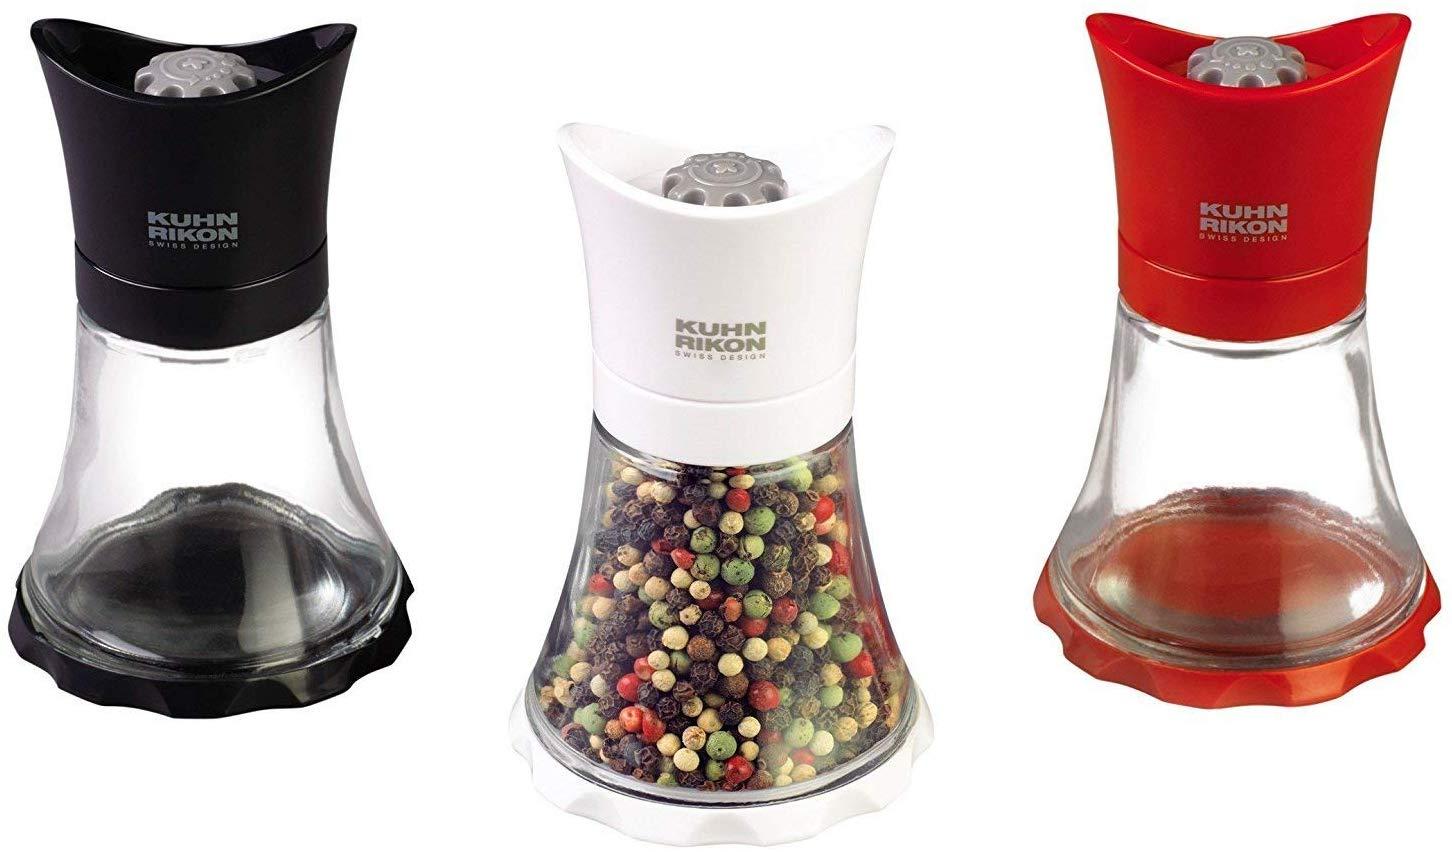 Kuhn Rikon Vase Grinder, Mini, Black